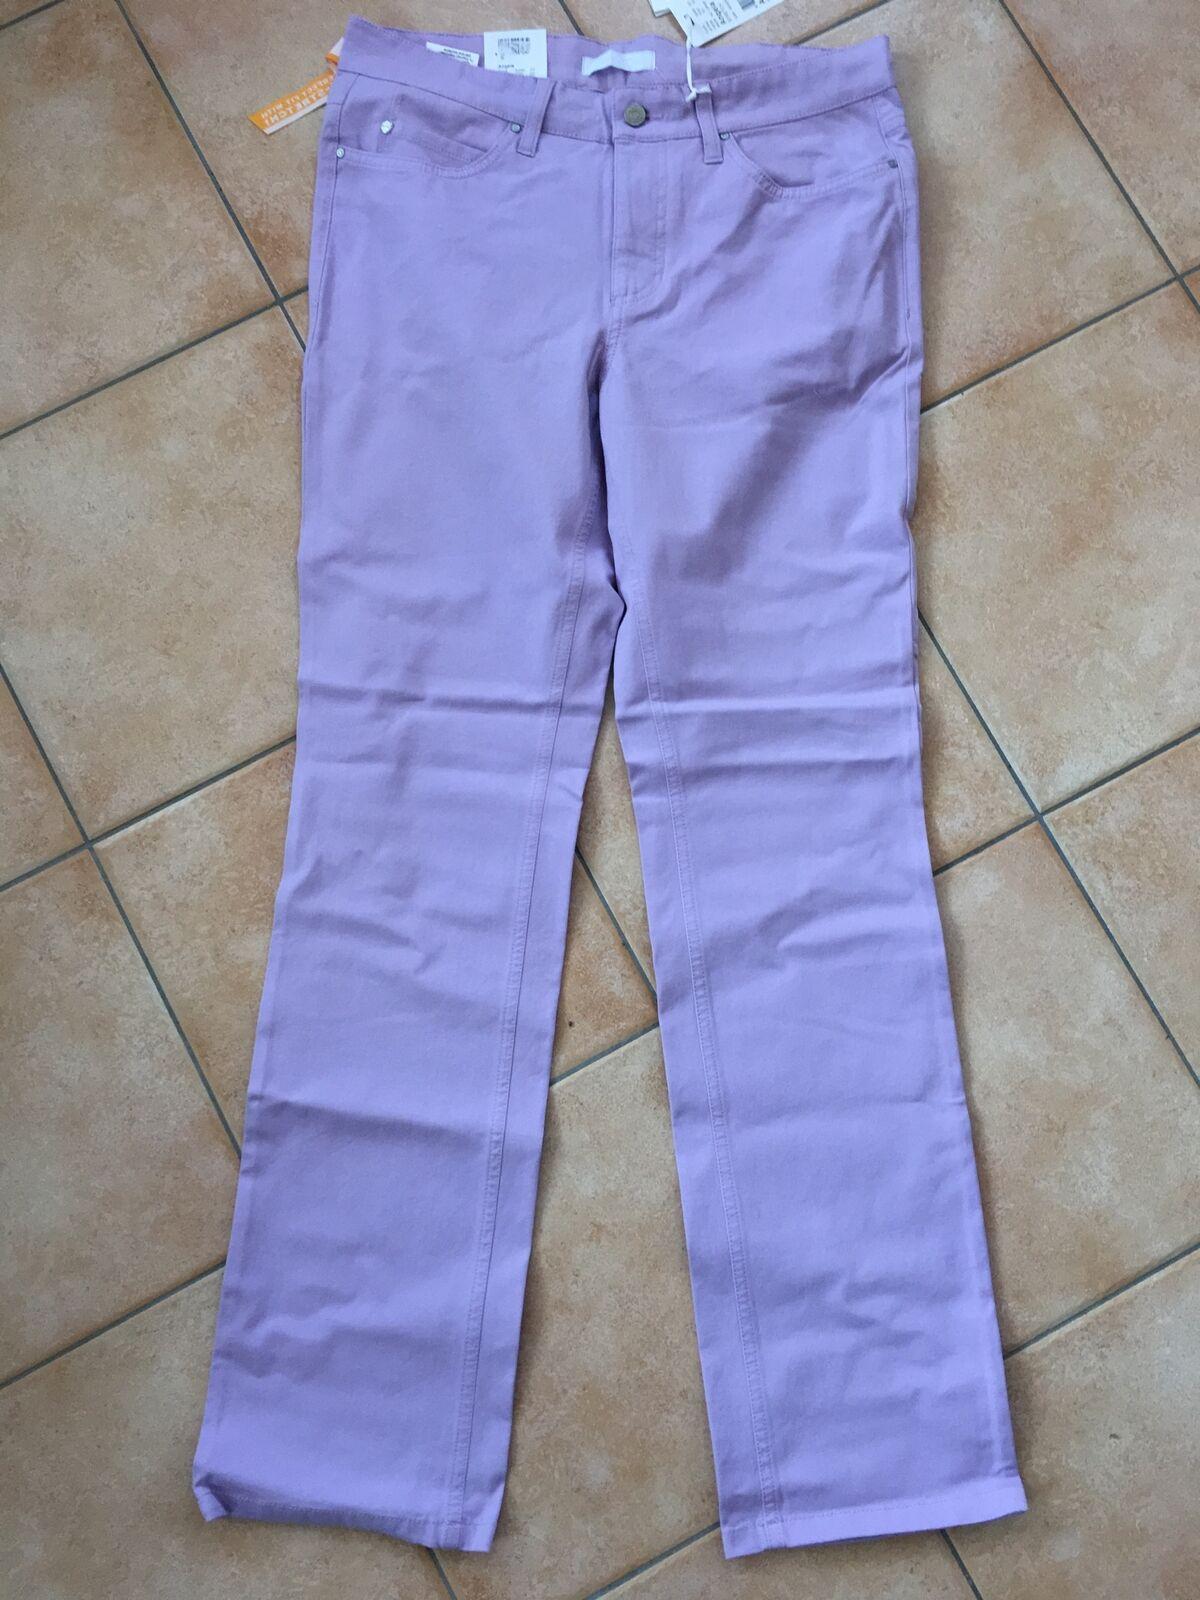 Mac Angela Stretch Jeans purplec Ladies' Pants Bi-Stretch New Trousers 0110-03-711